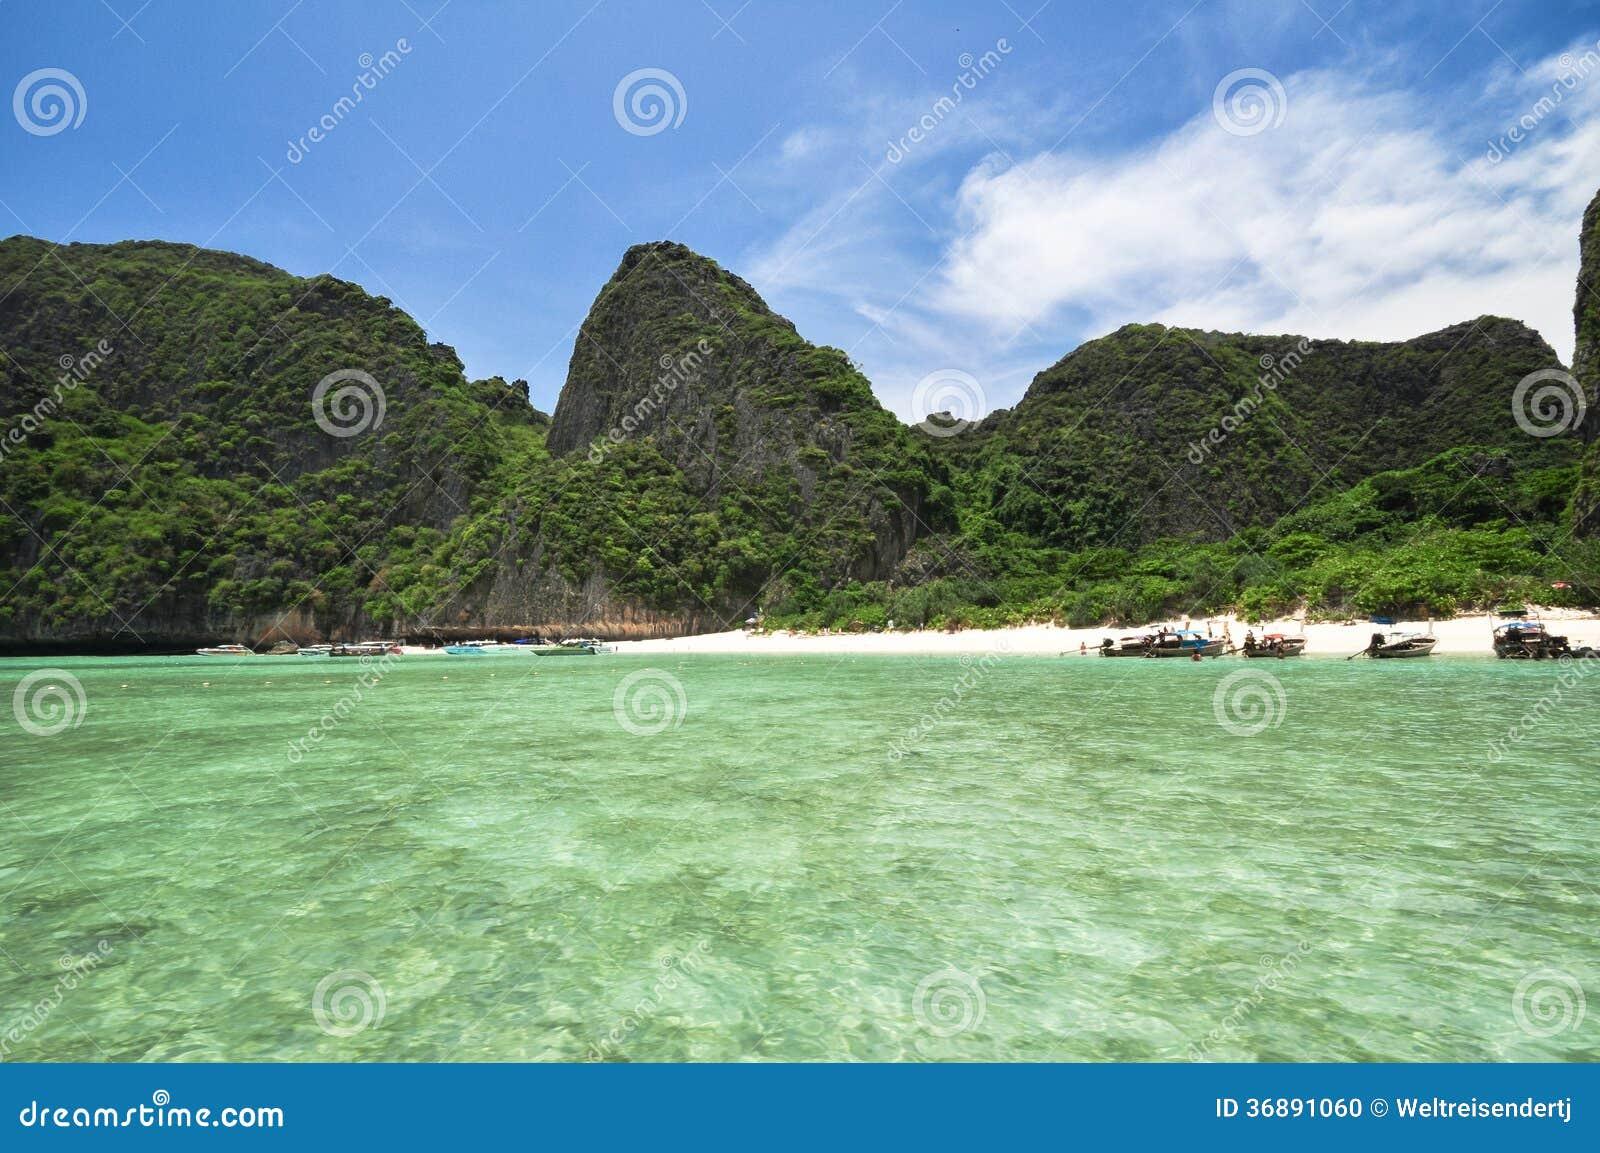 Download Isola del phi del phi fotografia stock. Immagine di verde - 36891060